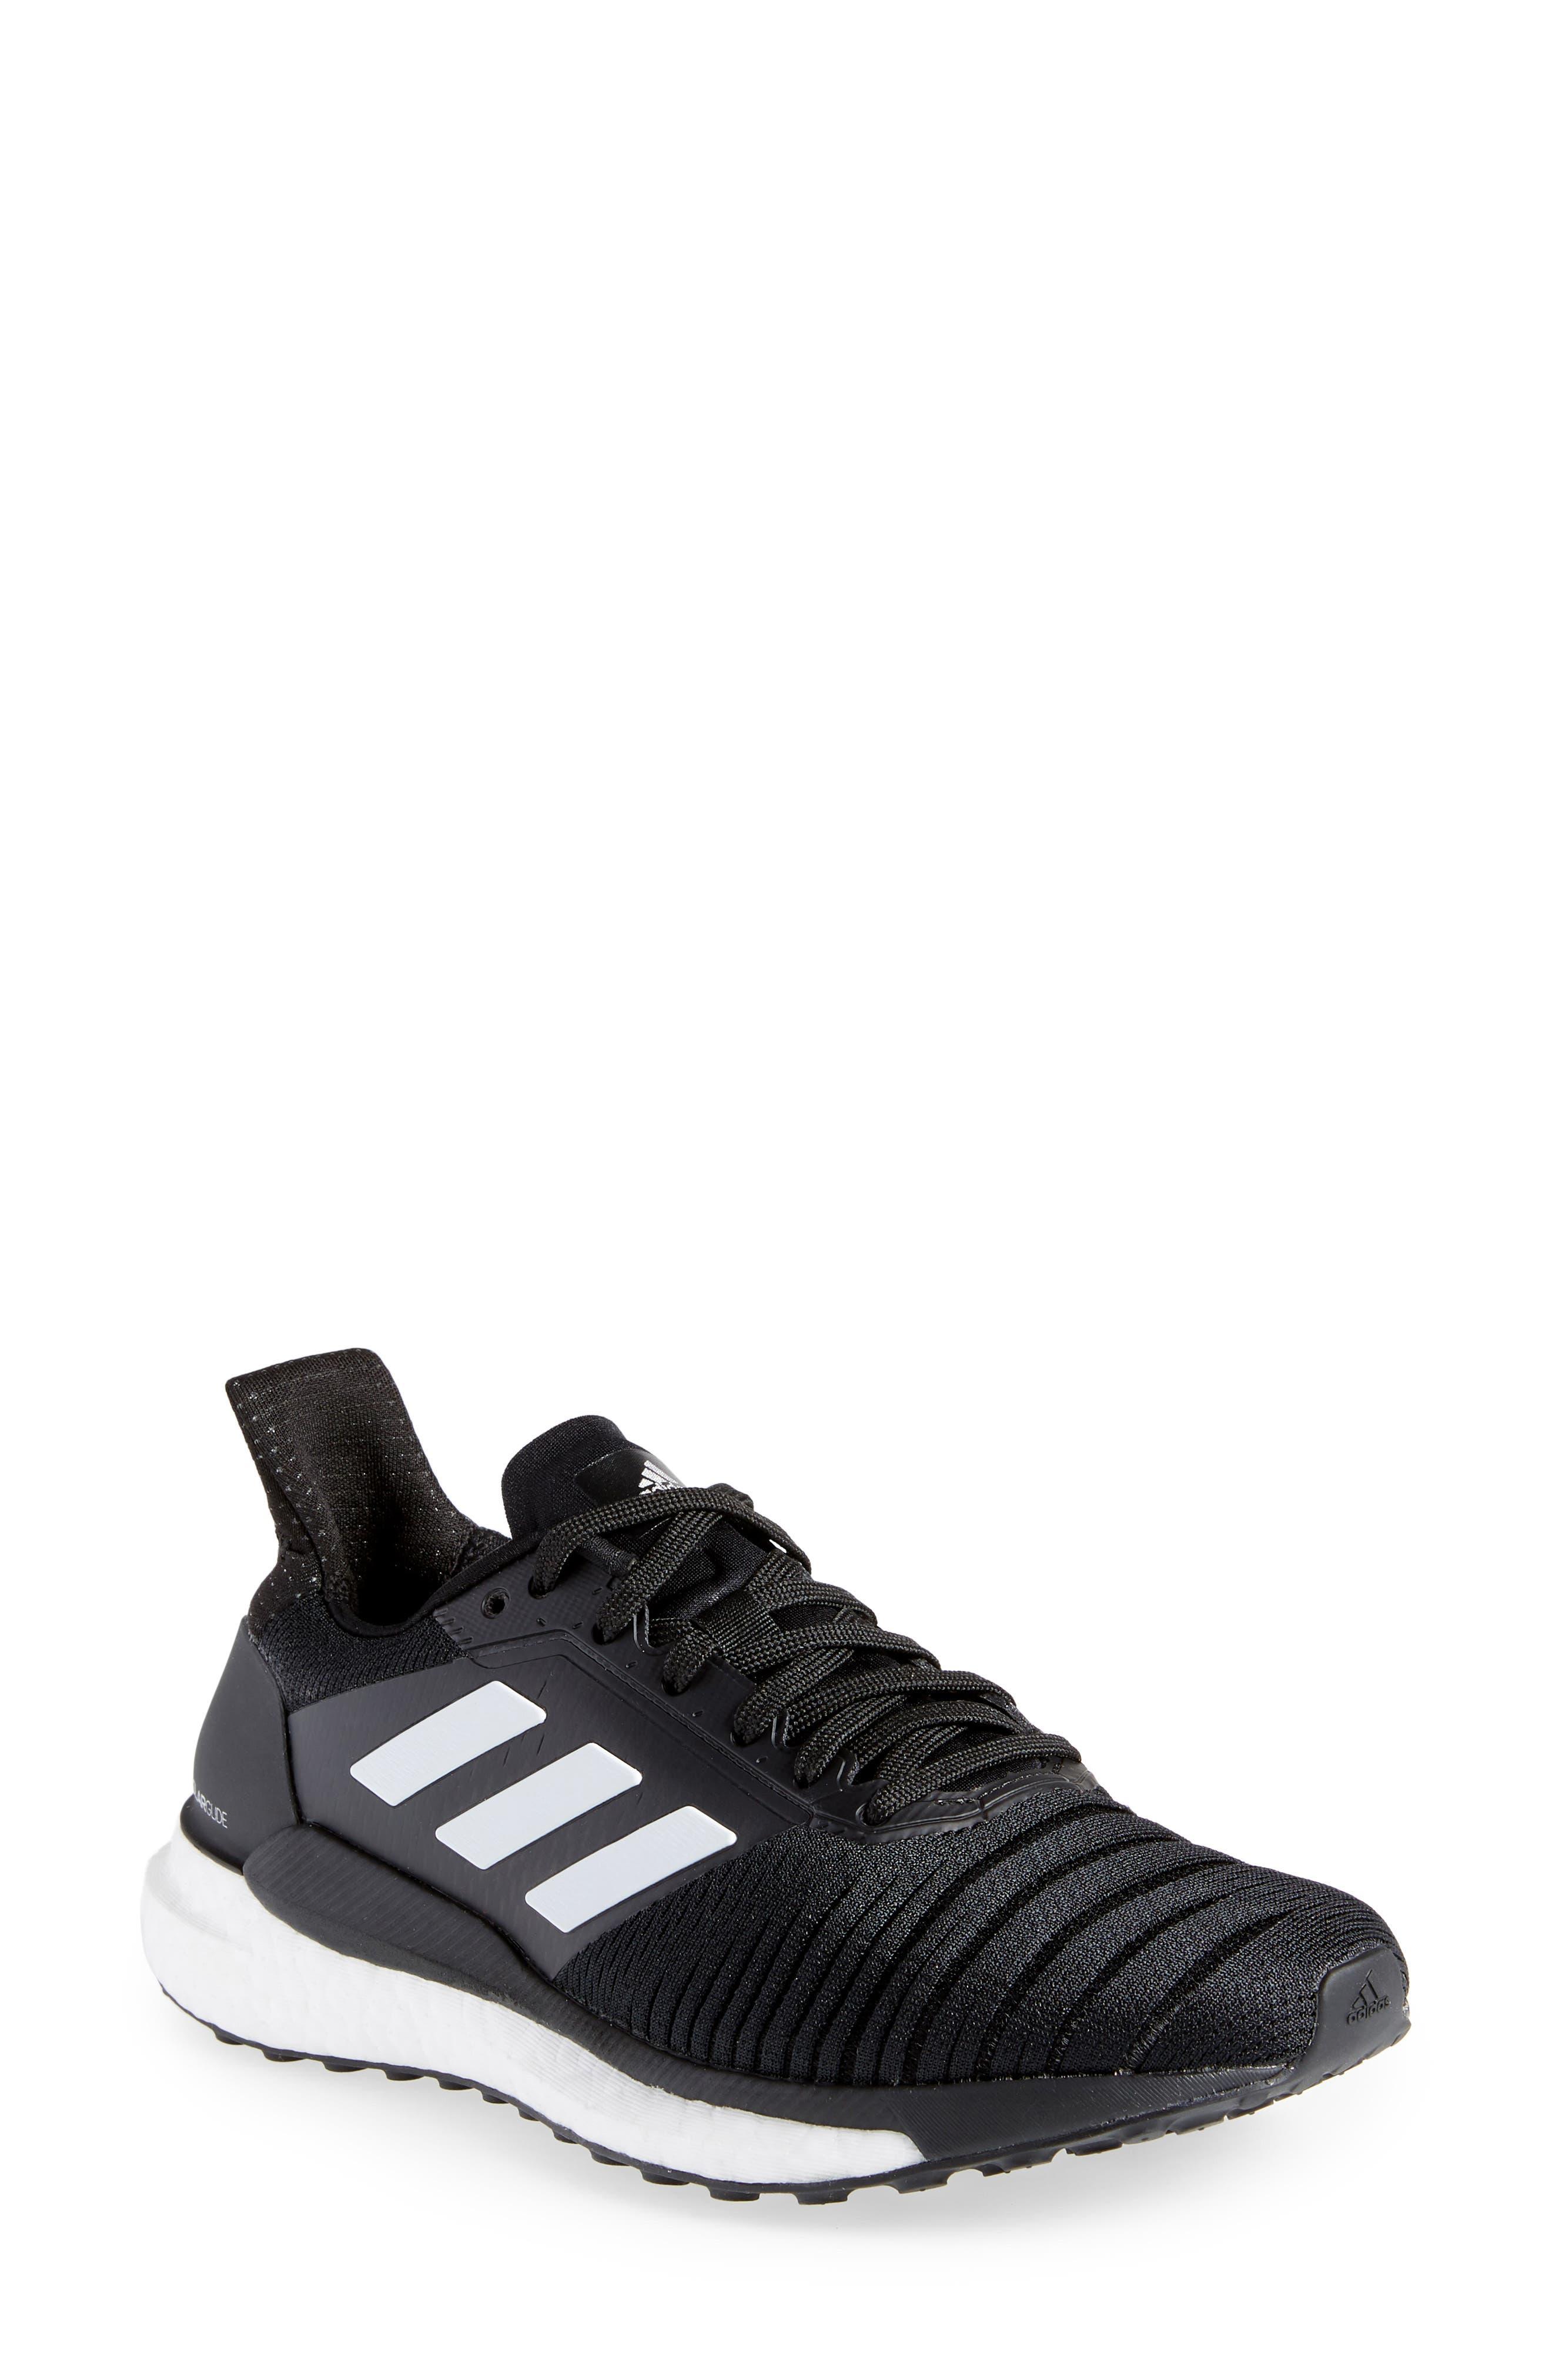 Solar Glide Running Shoe,                             Main thumbnail 1, color,                             BLACK/ WHITE/ BLACK